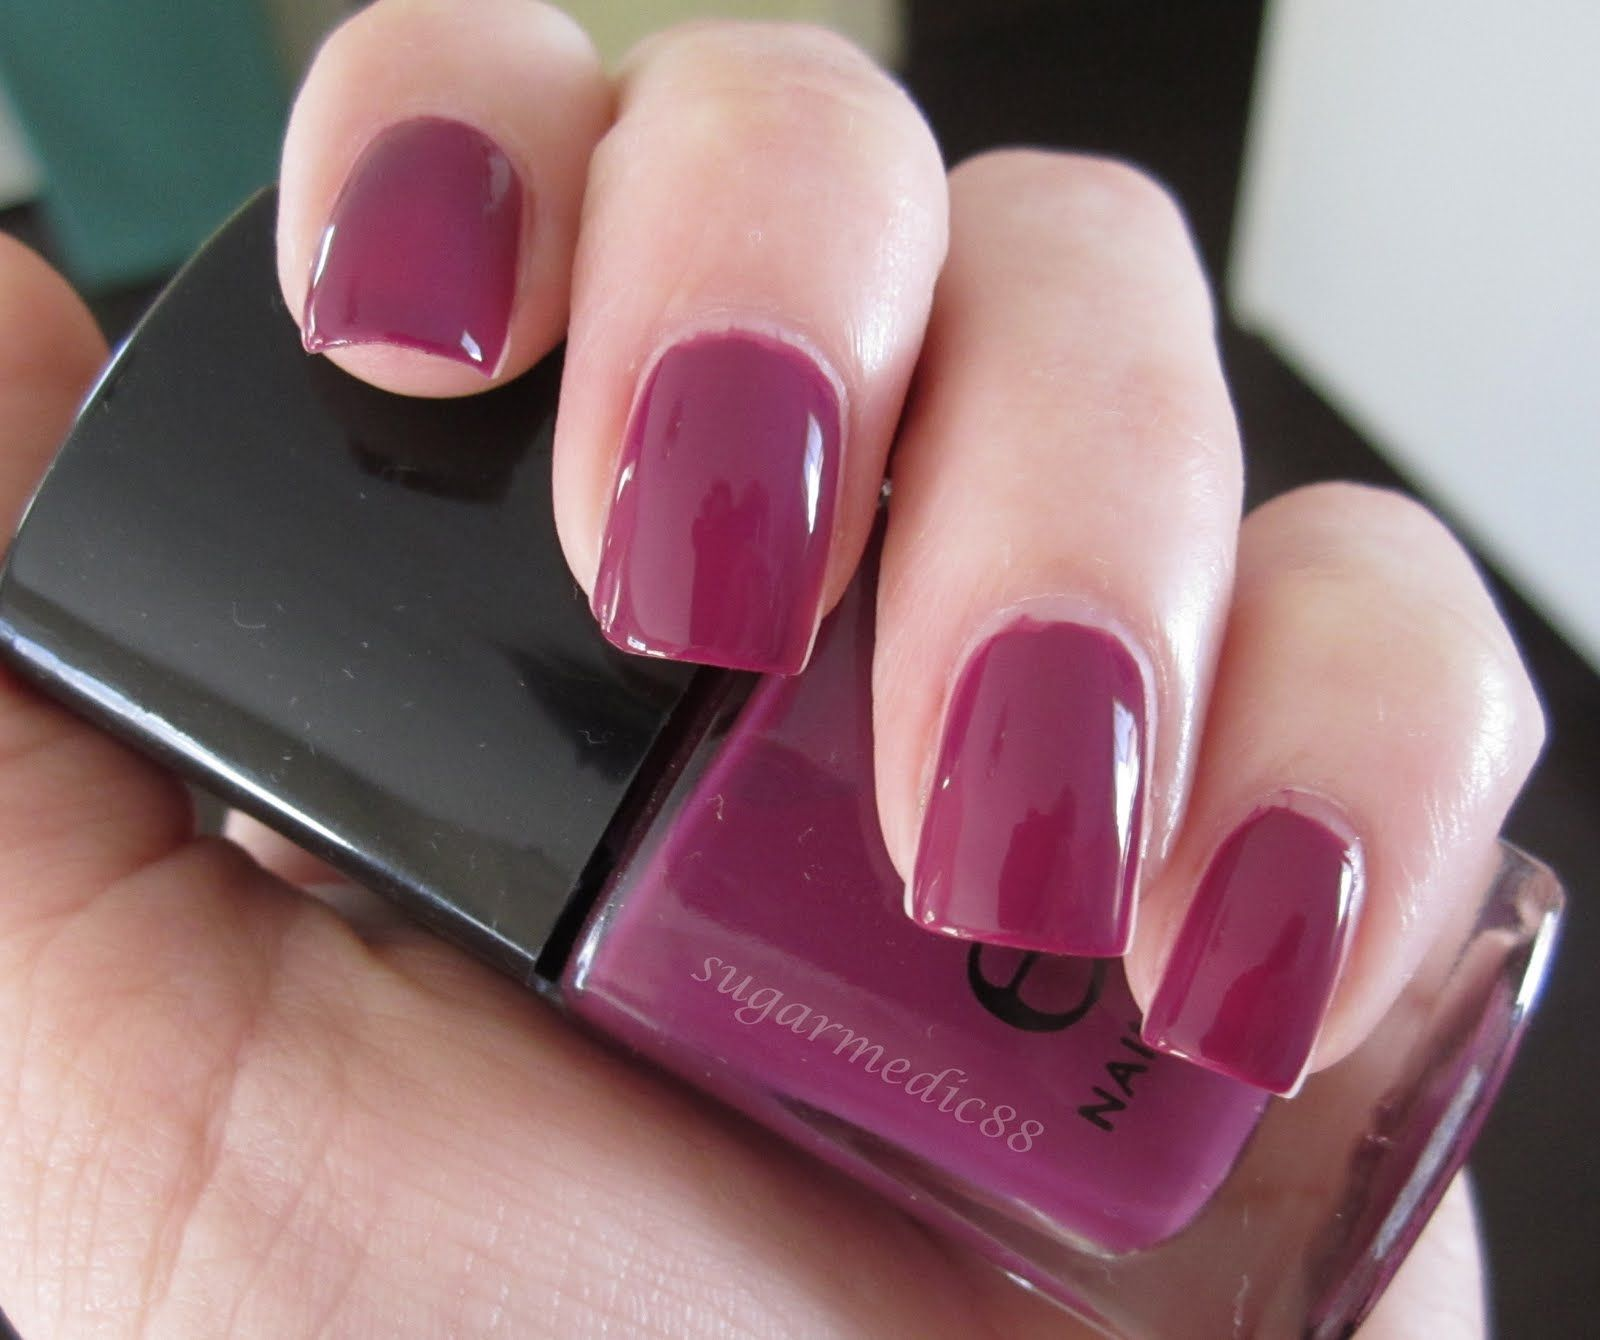 ELF Purple Pleaser | My Nail Polish Collection | Pinterest | Elf ...